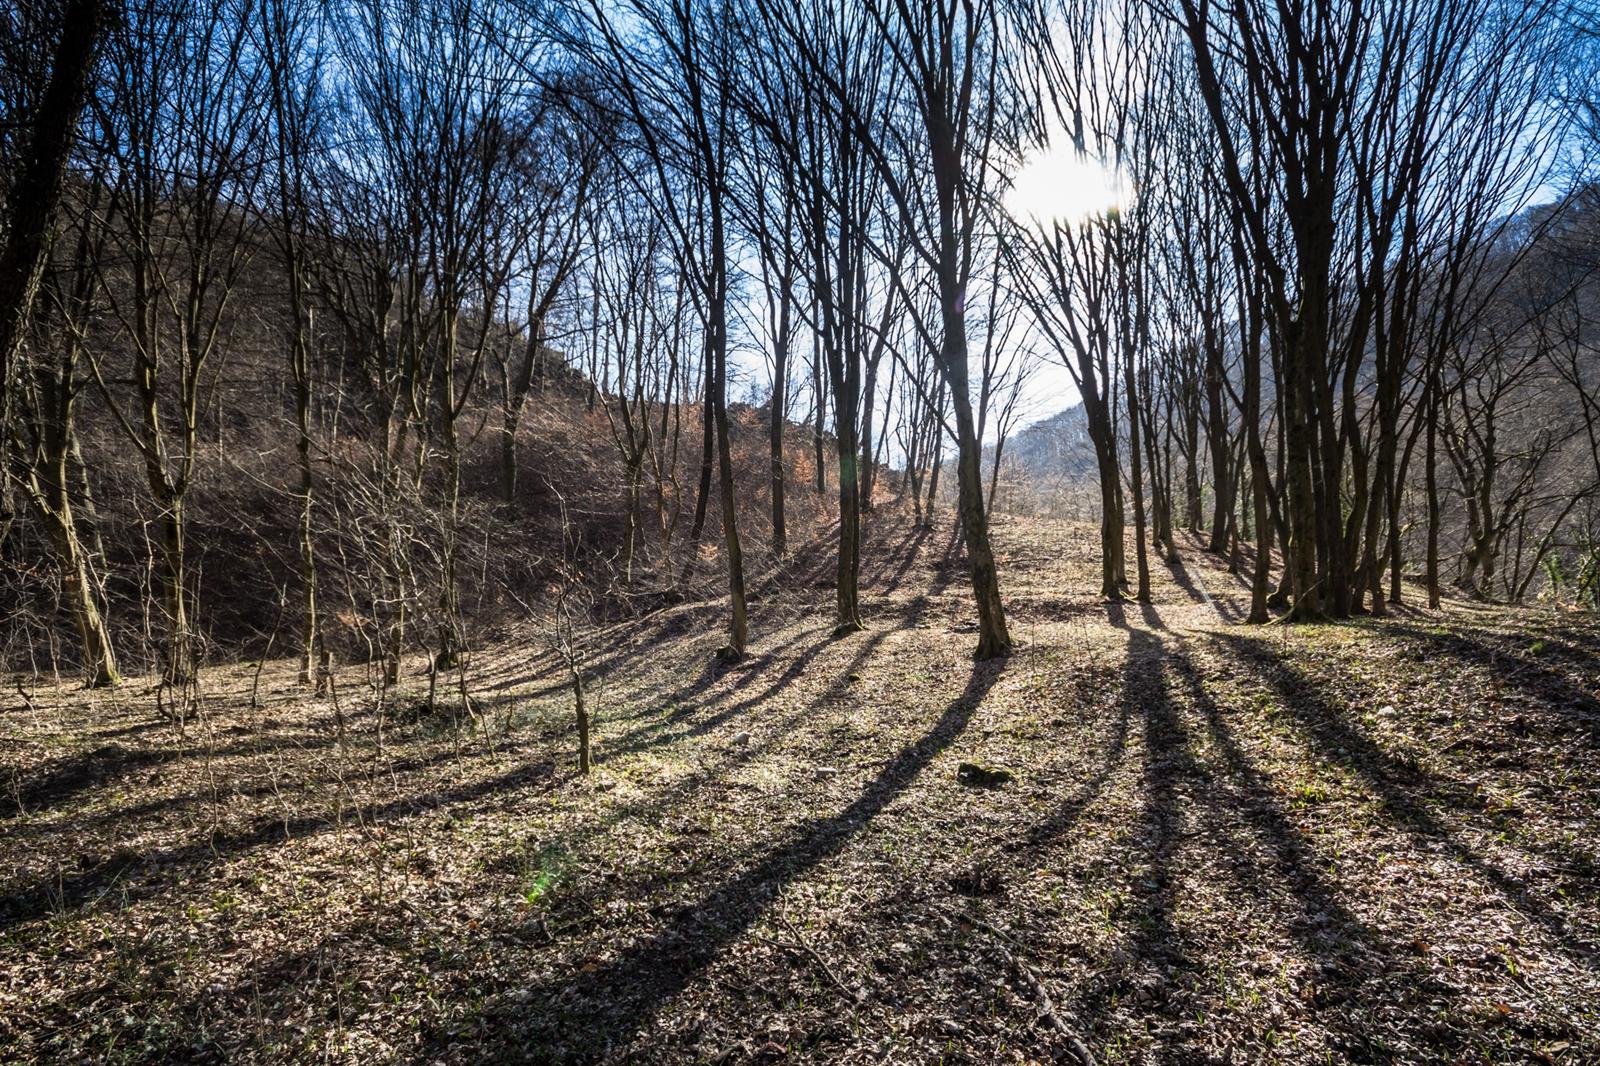 Traseul Miridului